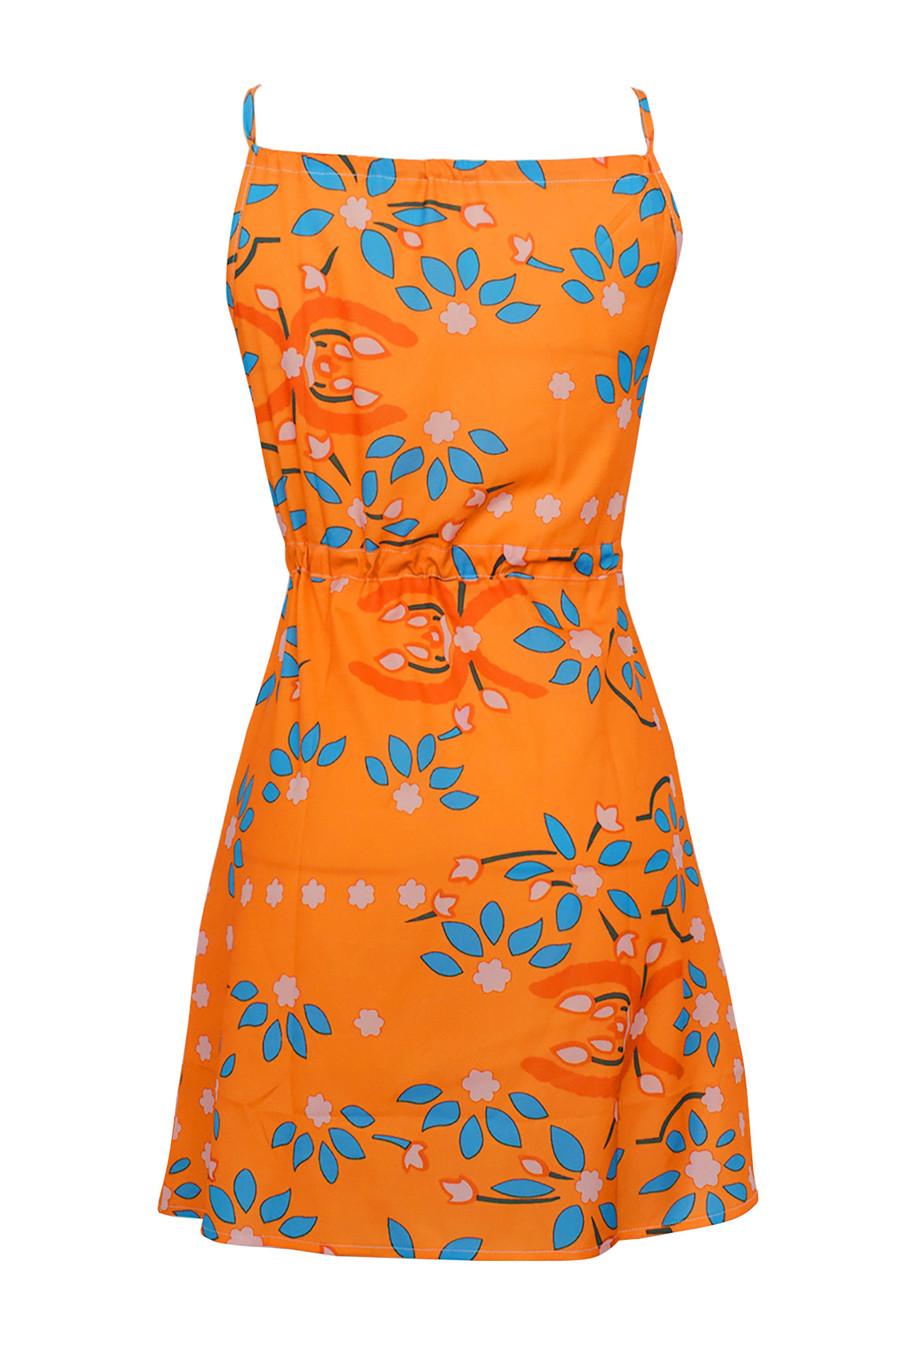 Gladiolus Chiffon Women Summer Dress Spaghetti Strap Floral Print Pocket Sexy Bohemian Beach Dress 2019 Short Ladies Dresses (17)